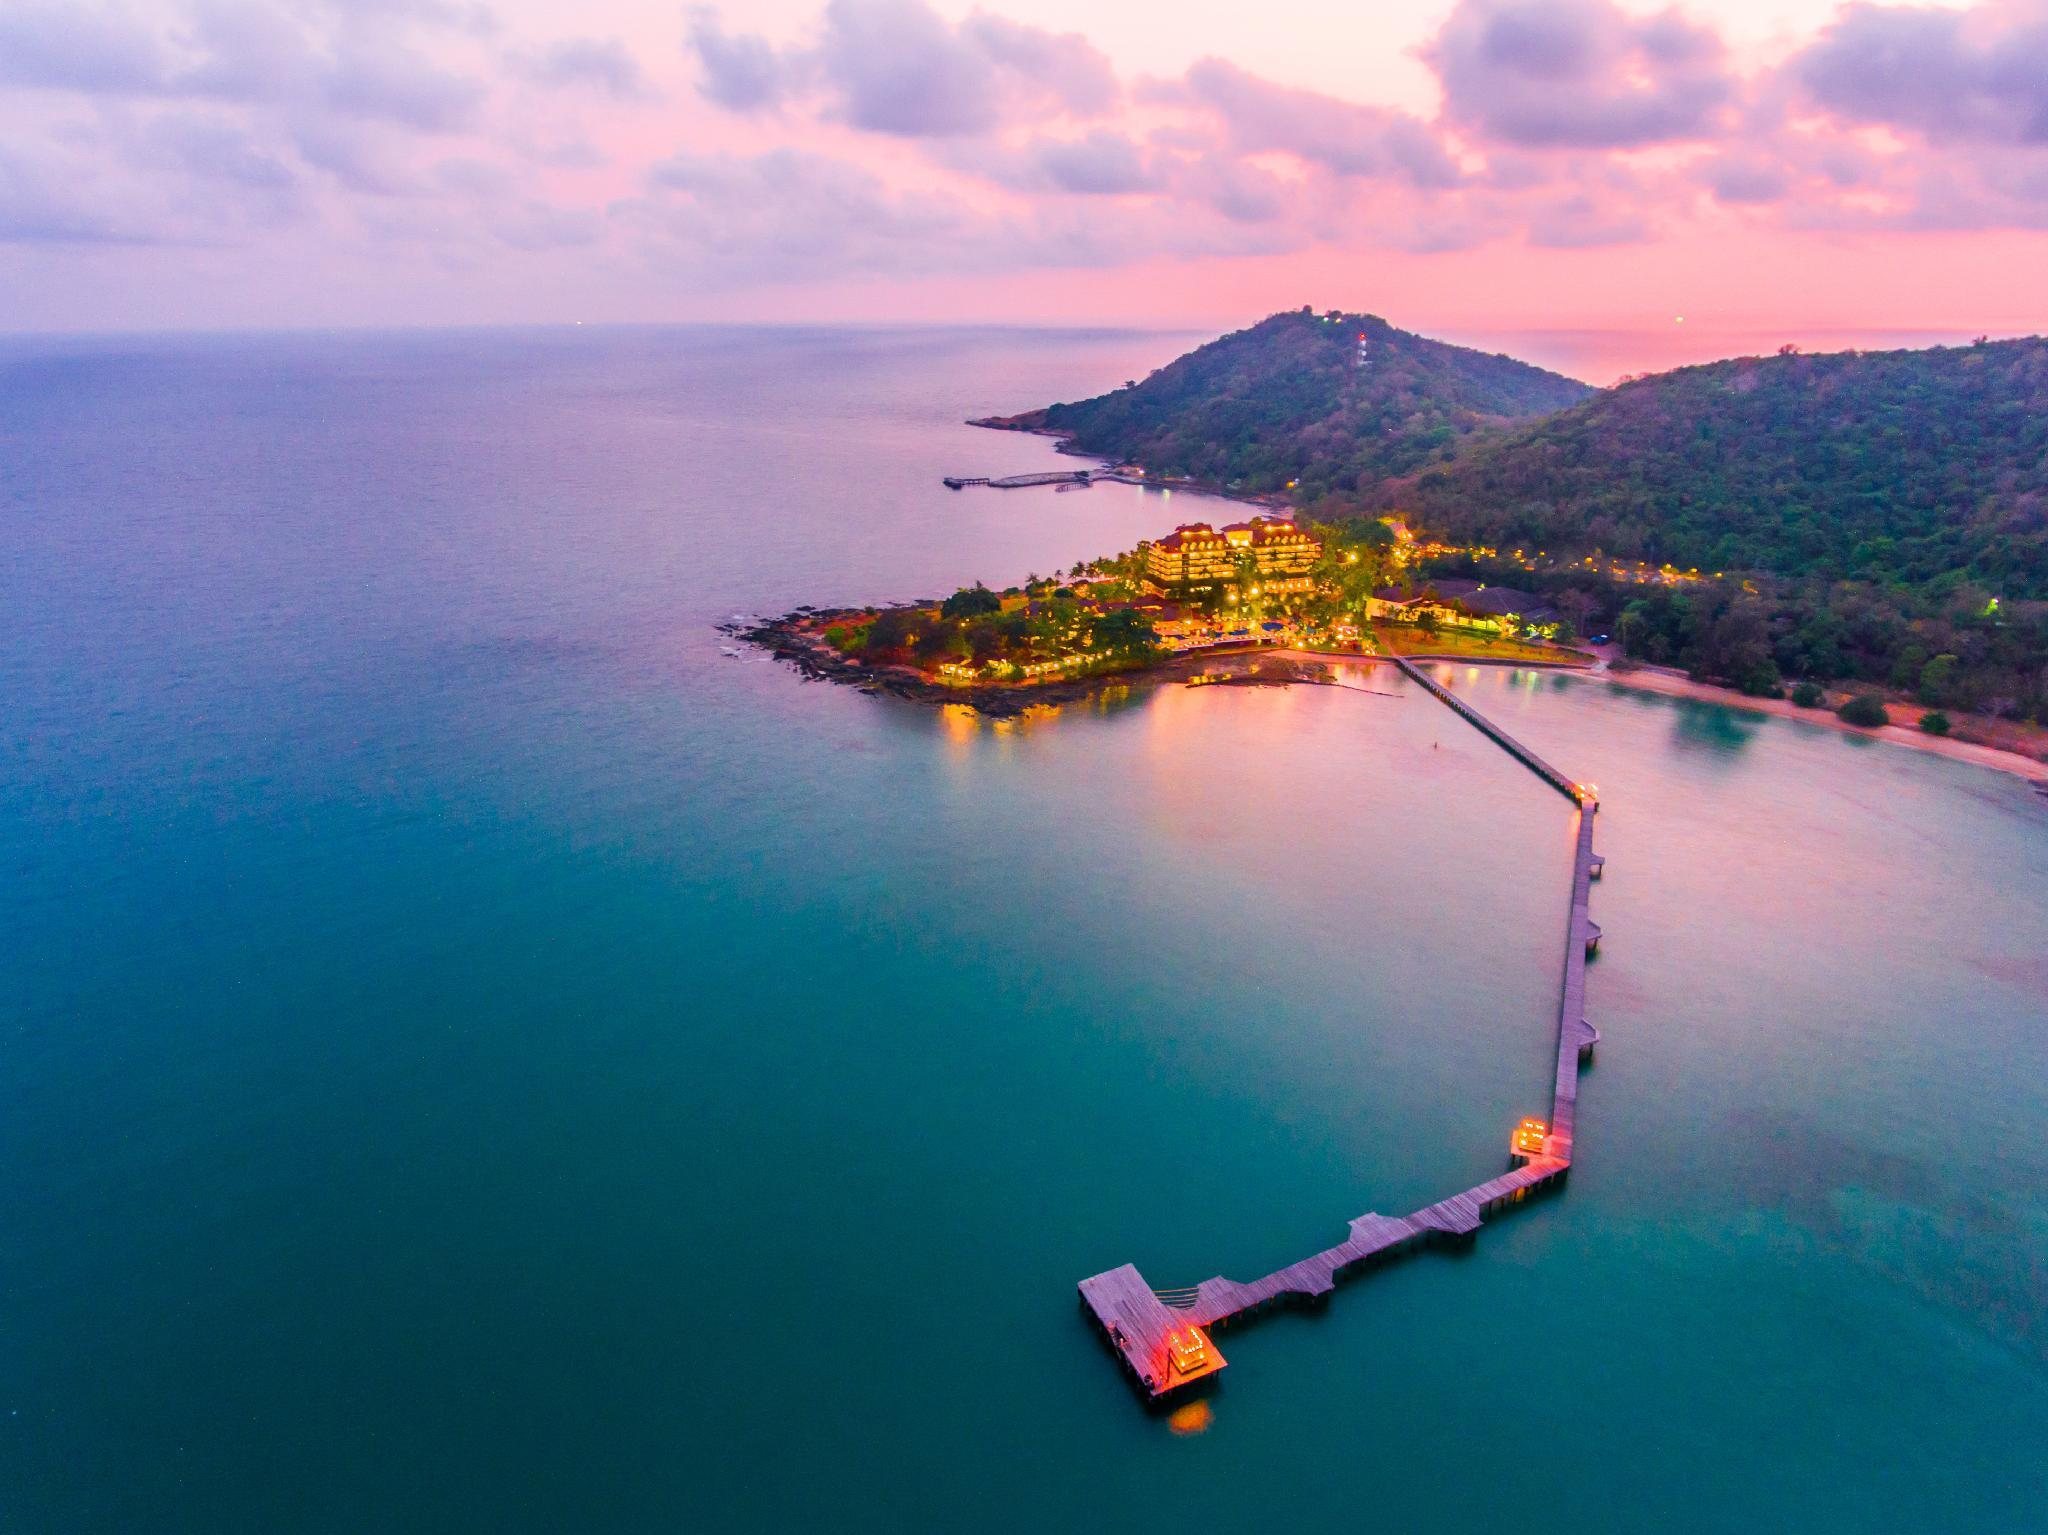 Rayong Resort & Spa Retreat ระยอง รีสอร์ต แอนด์ สปา รีทรีต